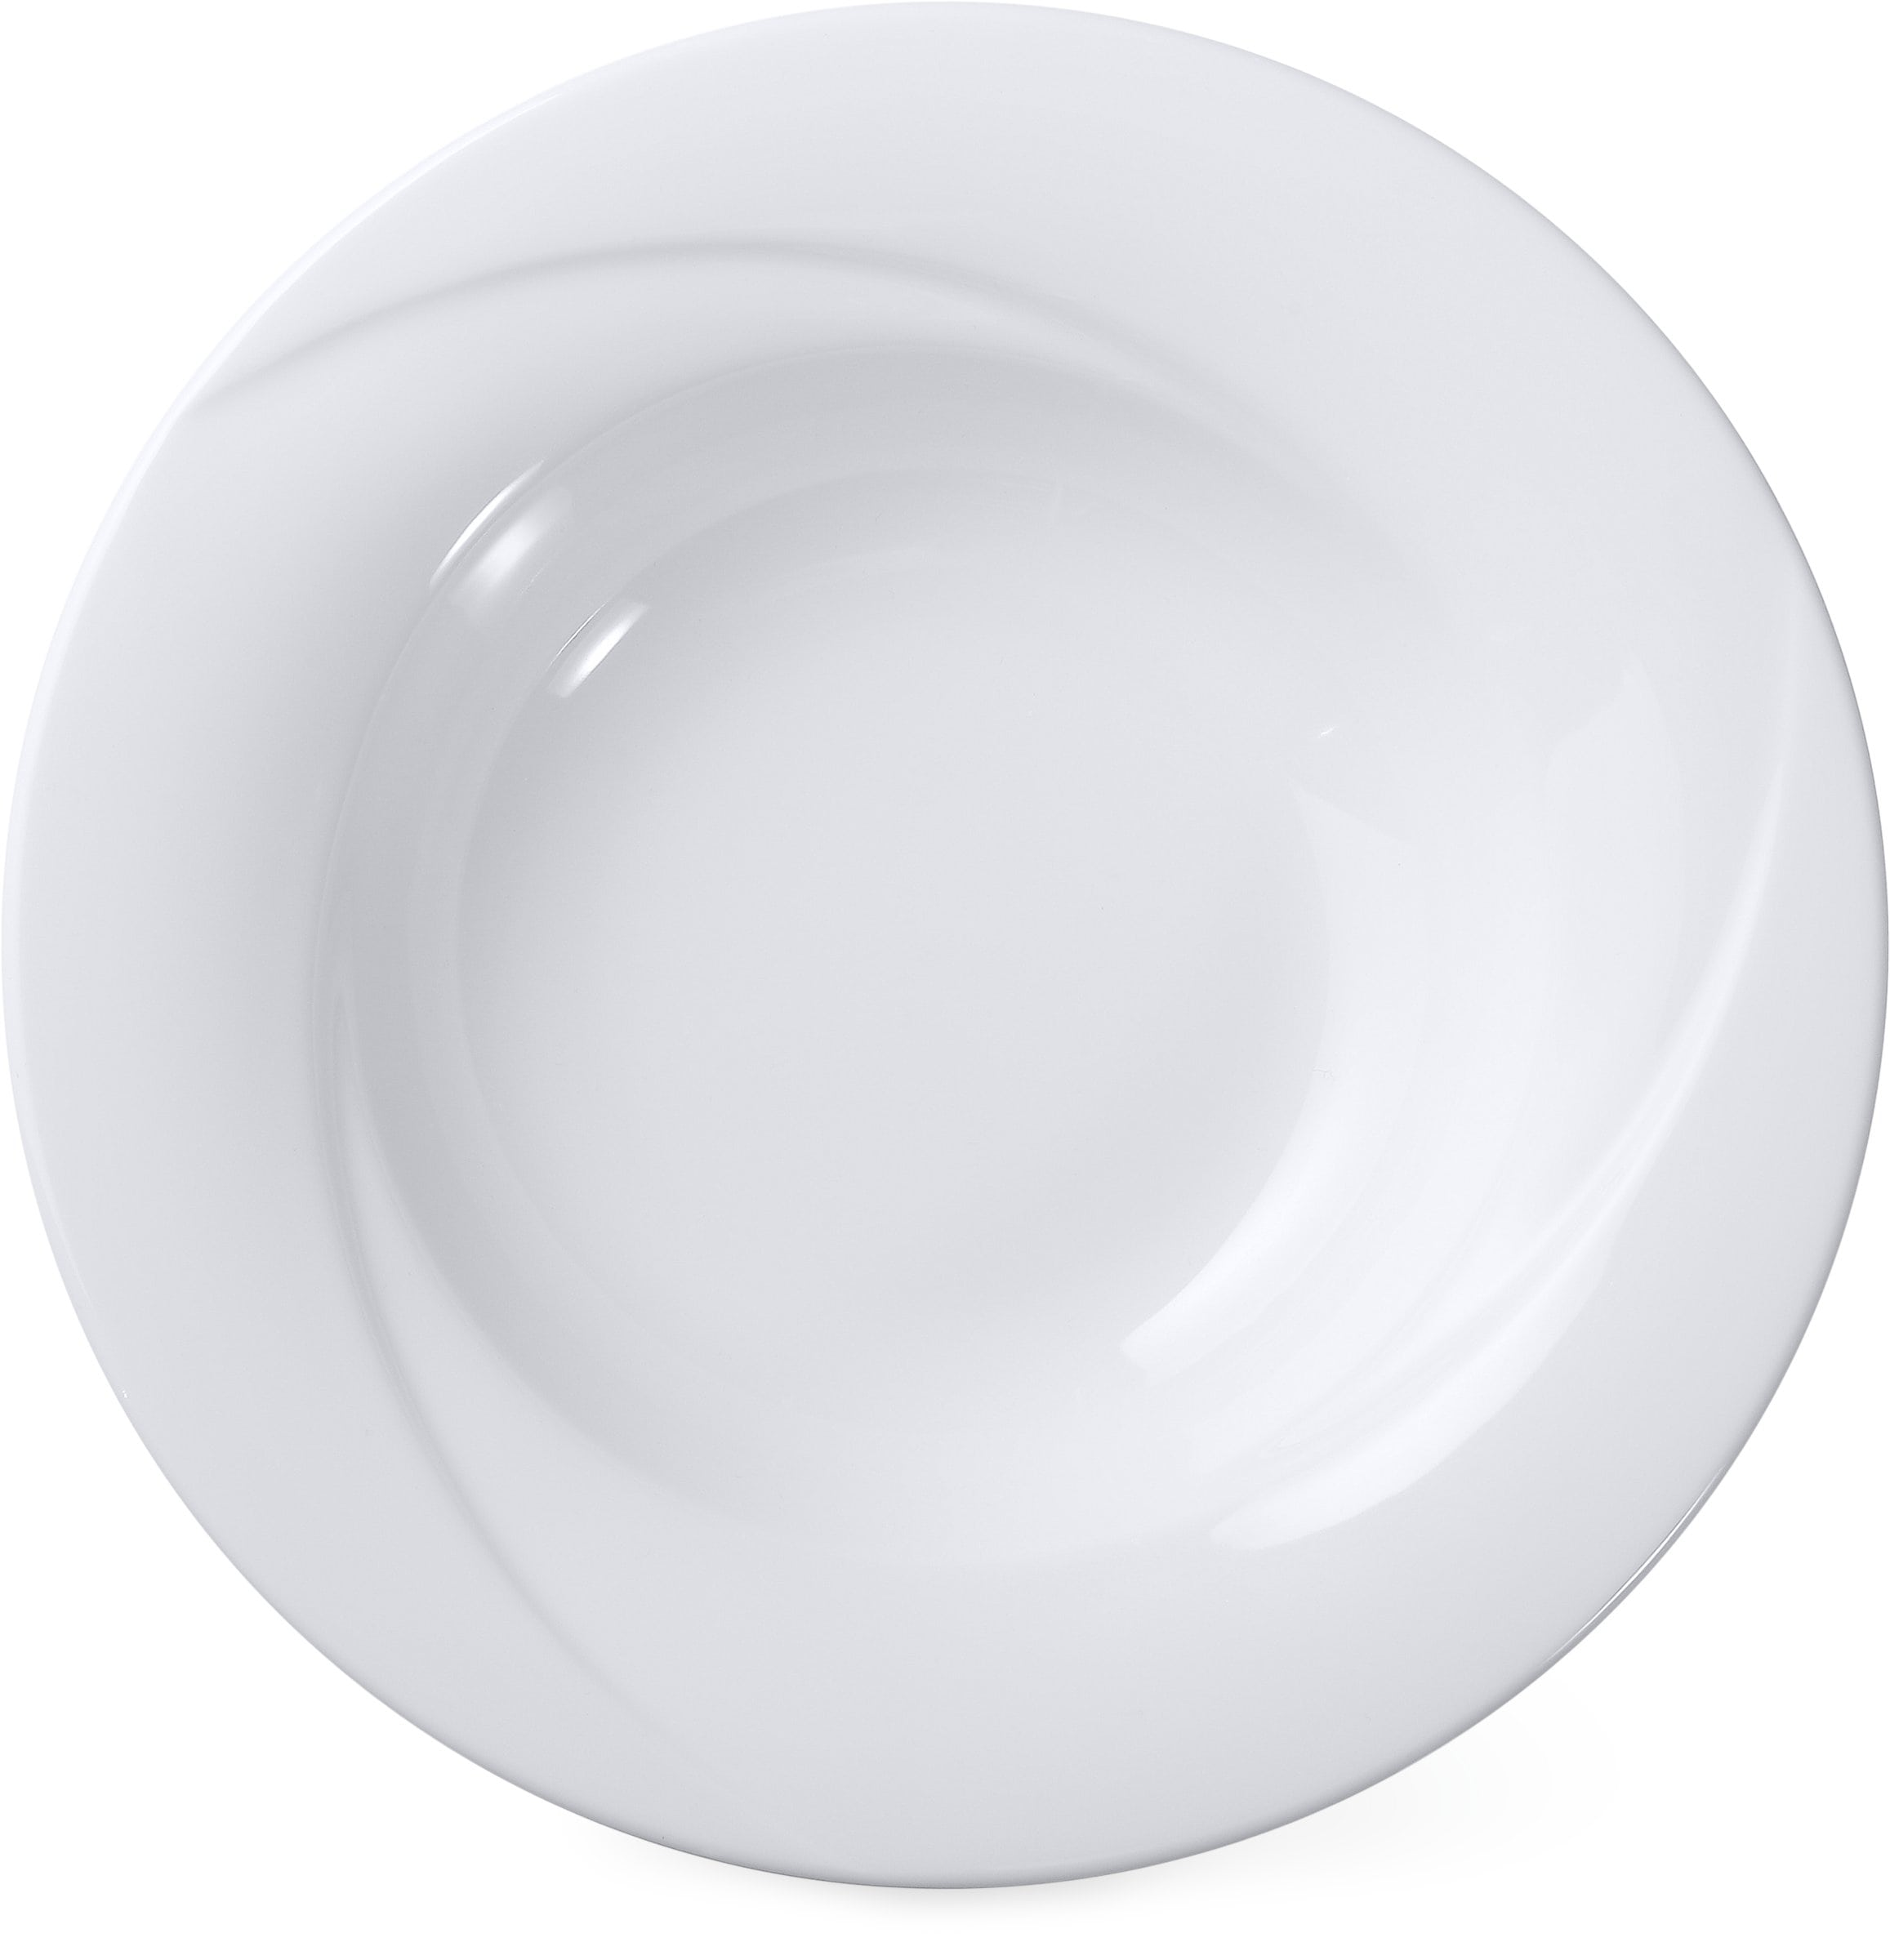 Cucina & Tavola NIKITA Assiette creuse